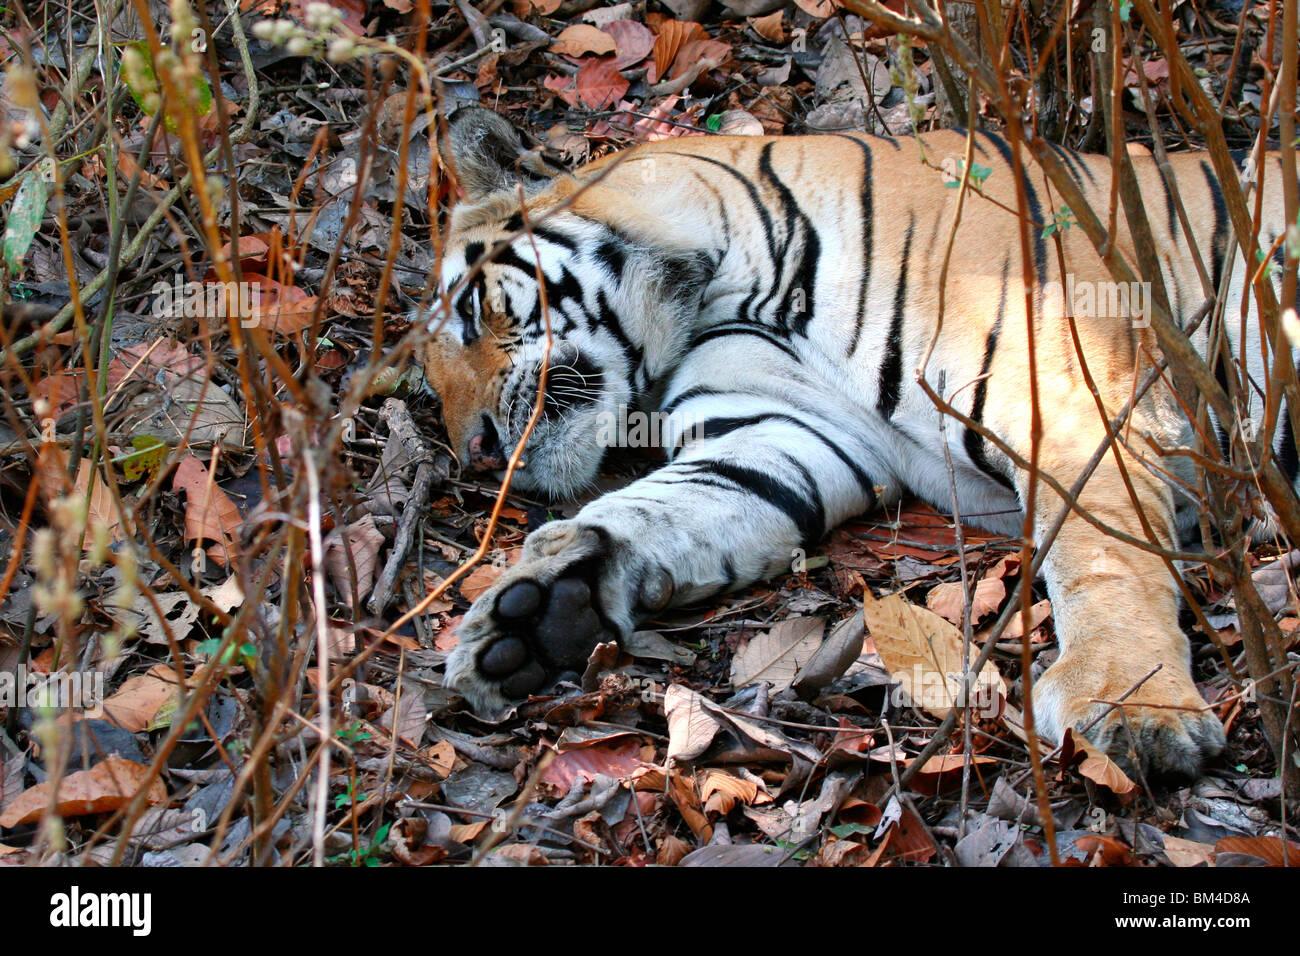 The Royal Bengal Tiger (Panthera tigris tigris) sleeping in Kanha National Park, Madhya Pradesh, India, Asia Stock Photo